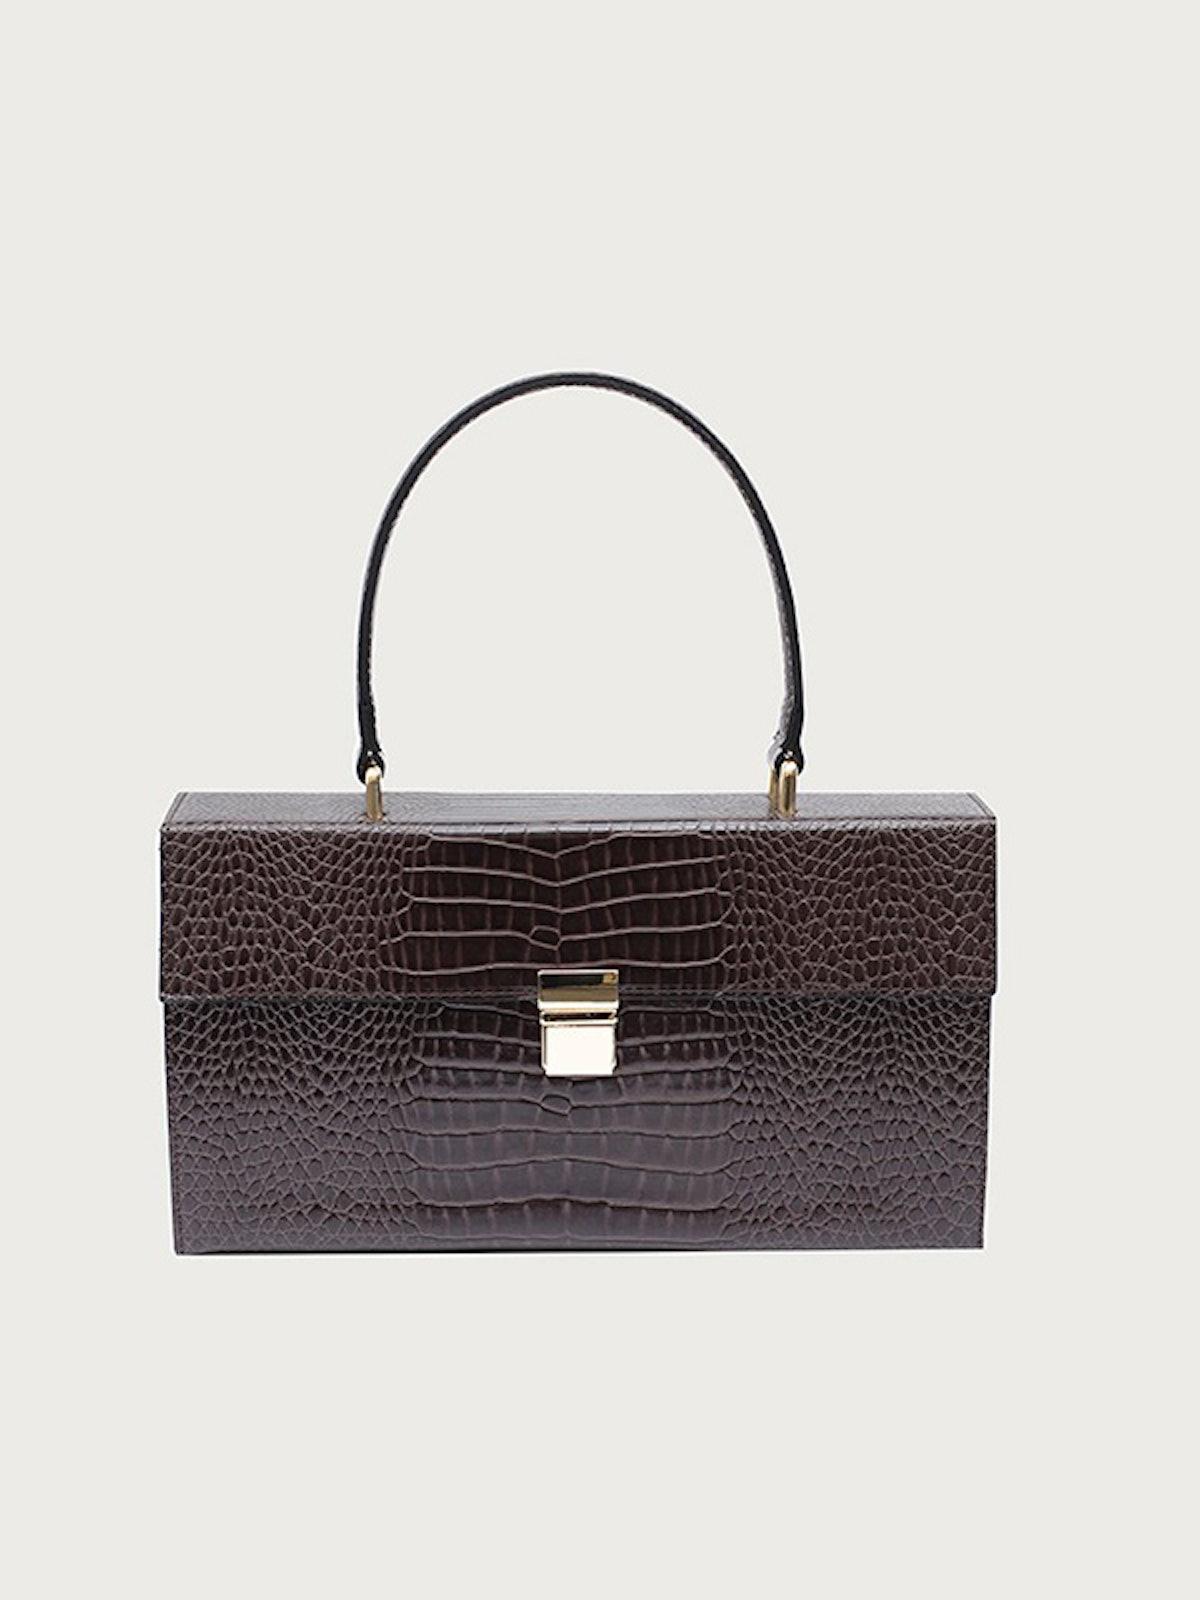 Brown Croc Rectangular Clutch Bag